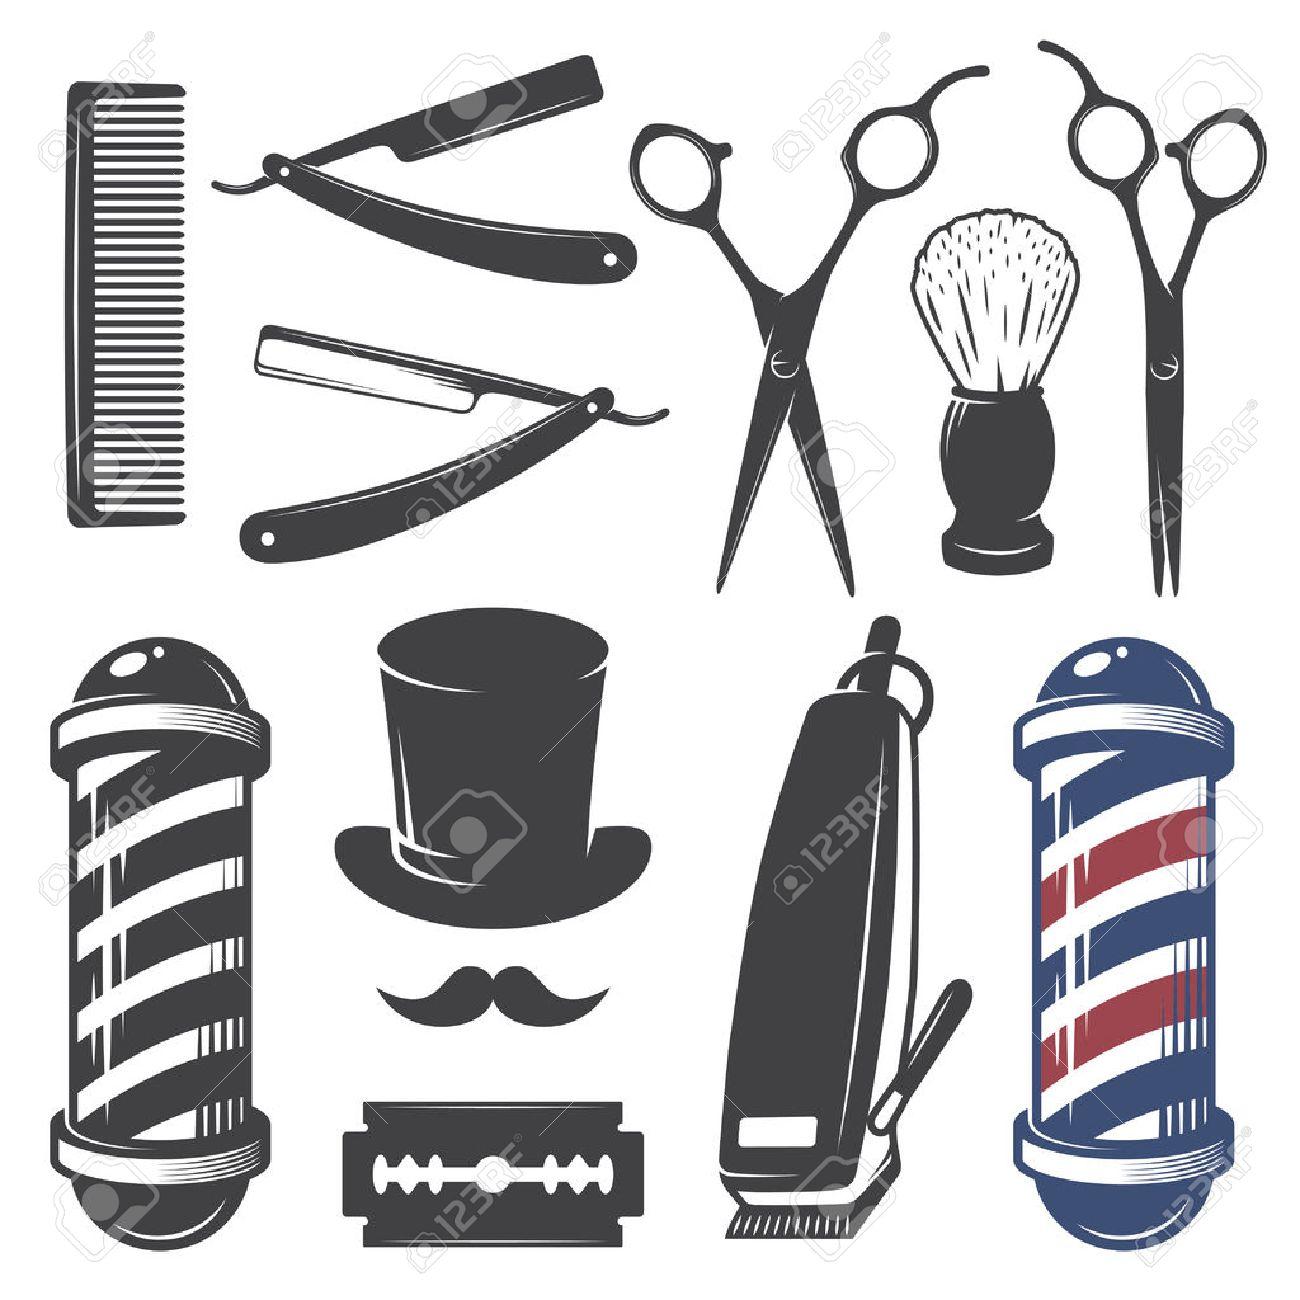 Set Of Vintage Barber Shop Elements Monochrome Linear Style Stock Vector